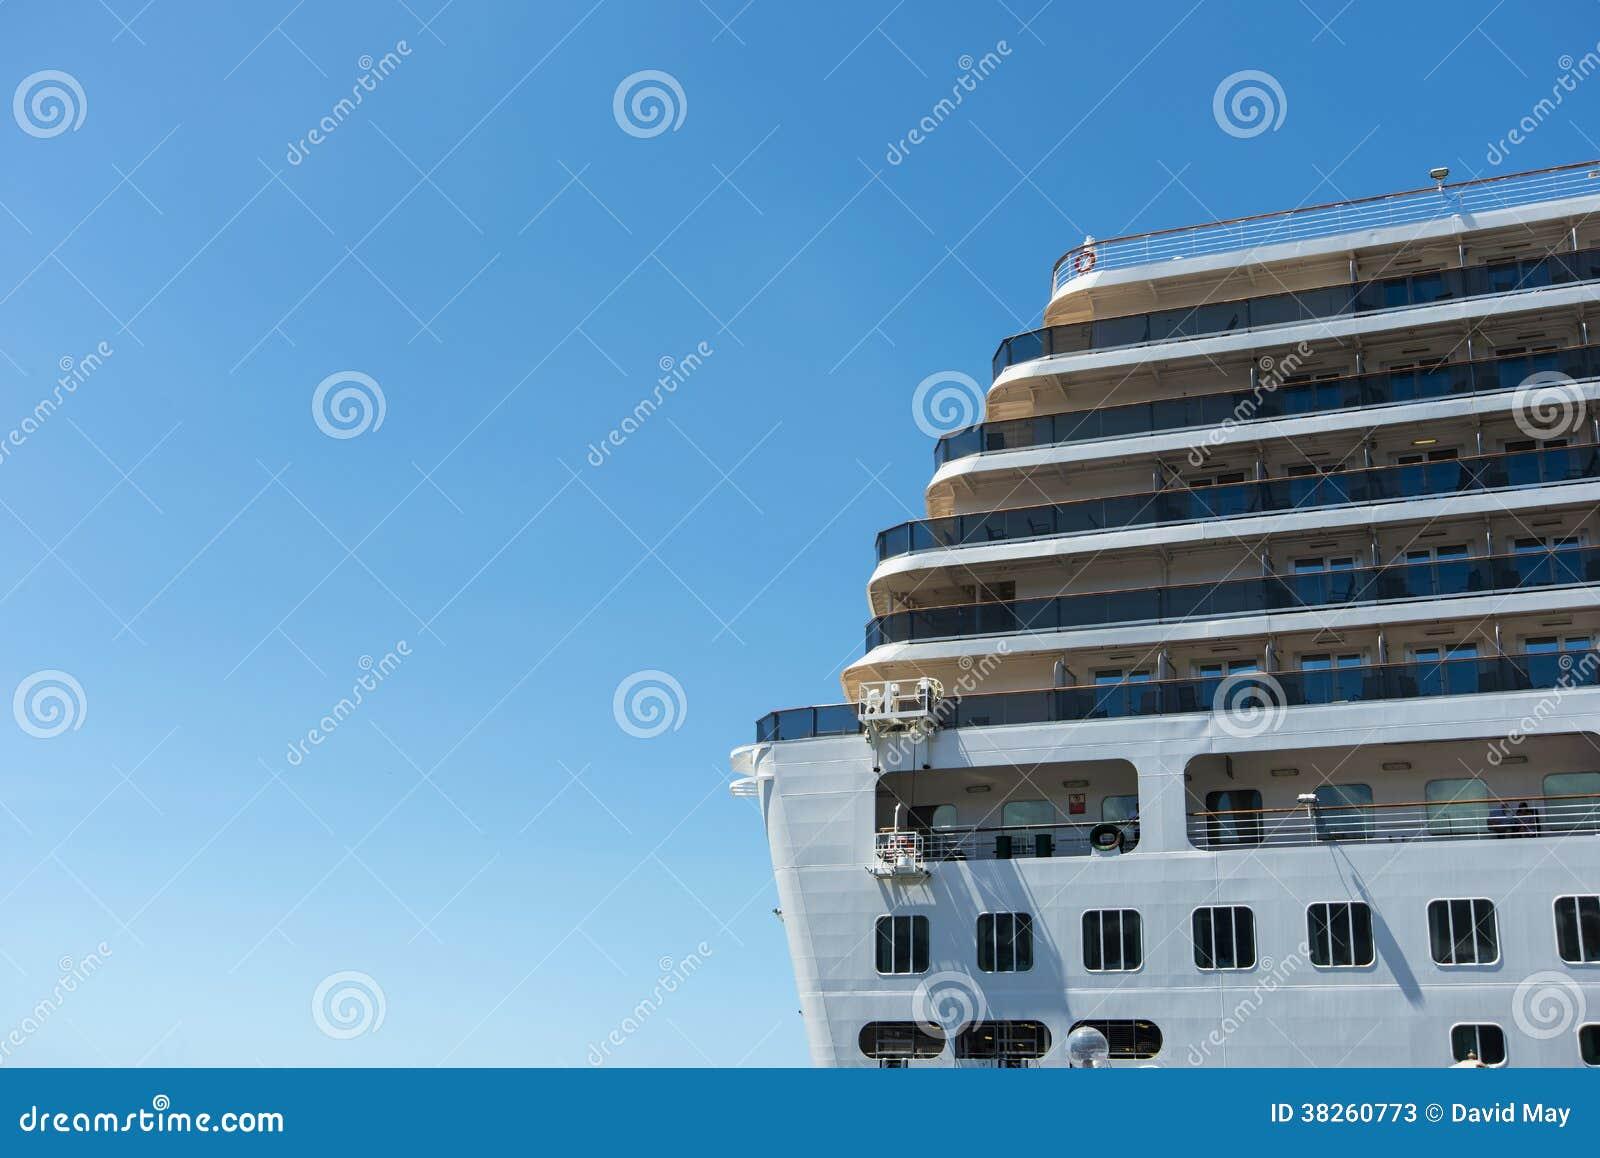 Stern Of Cruise Ship Stock Photos  Image 38260773